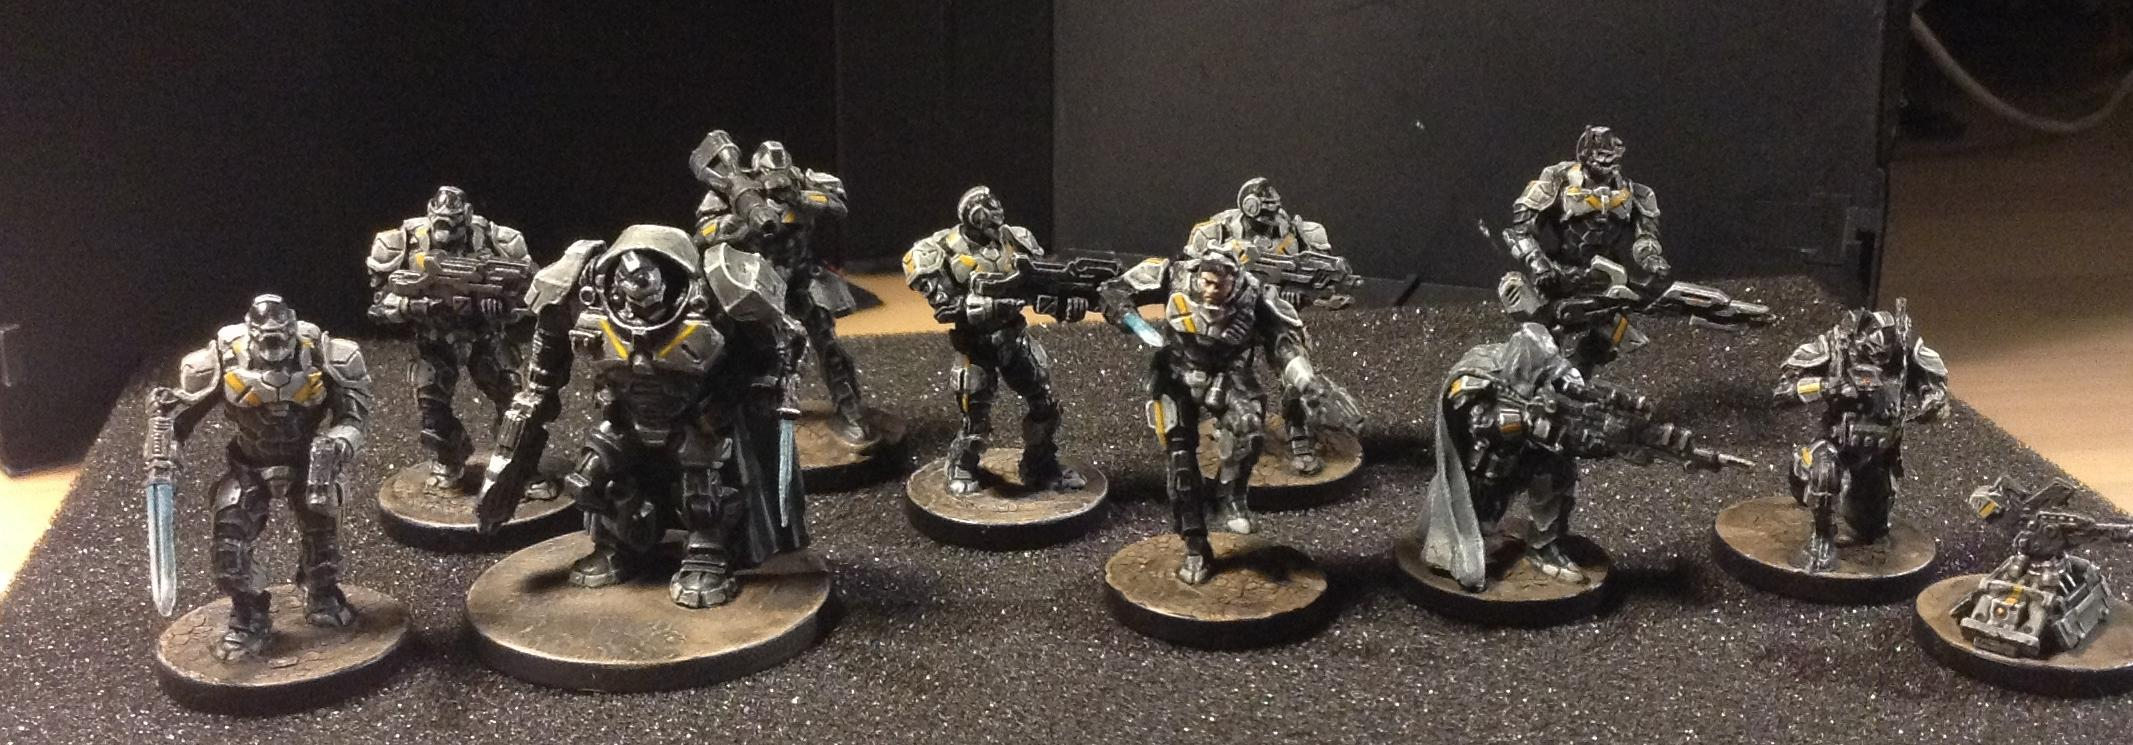 Armor, Enforces, Mantic, Riccardo Margarolo, Scifi